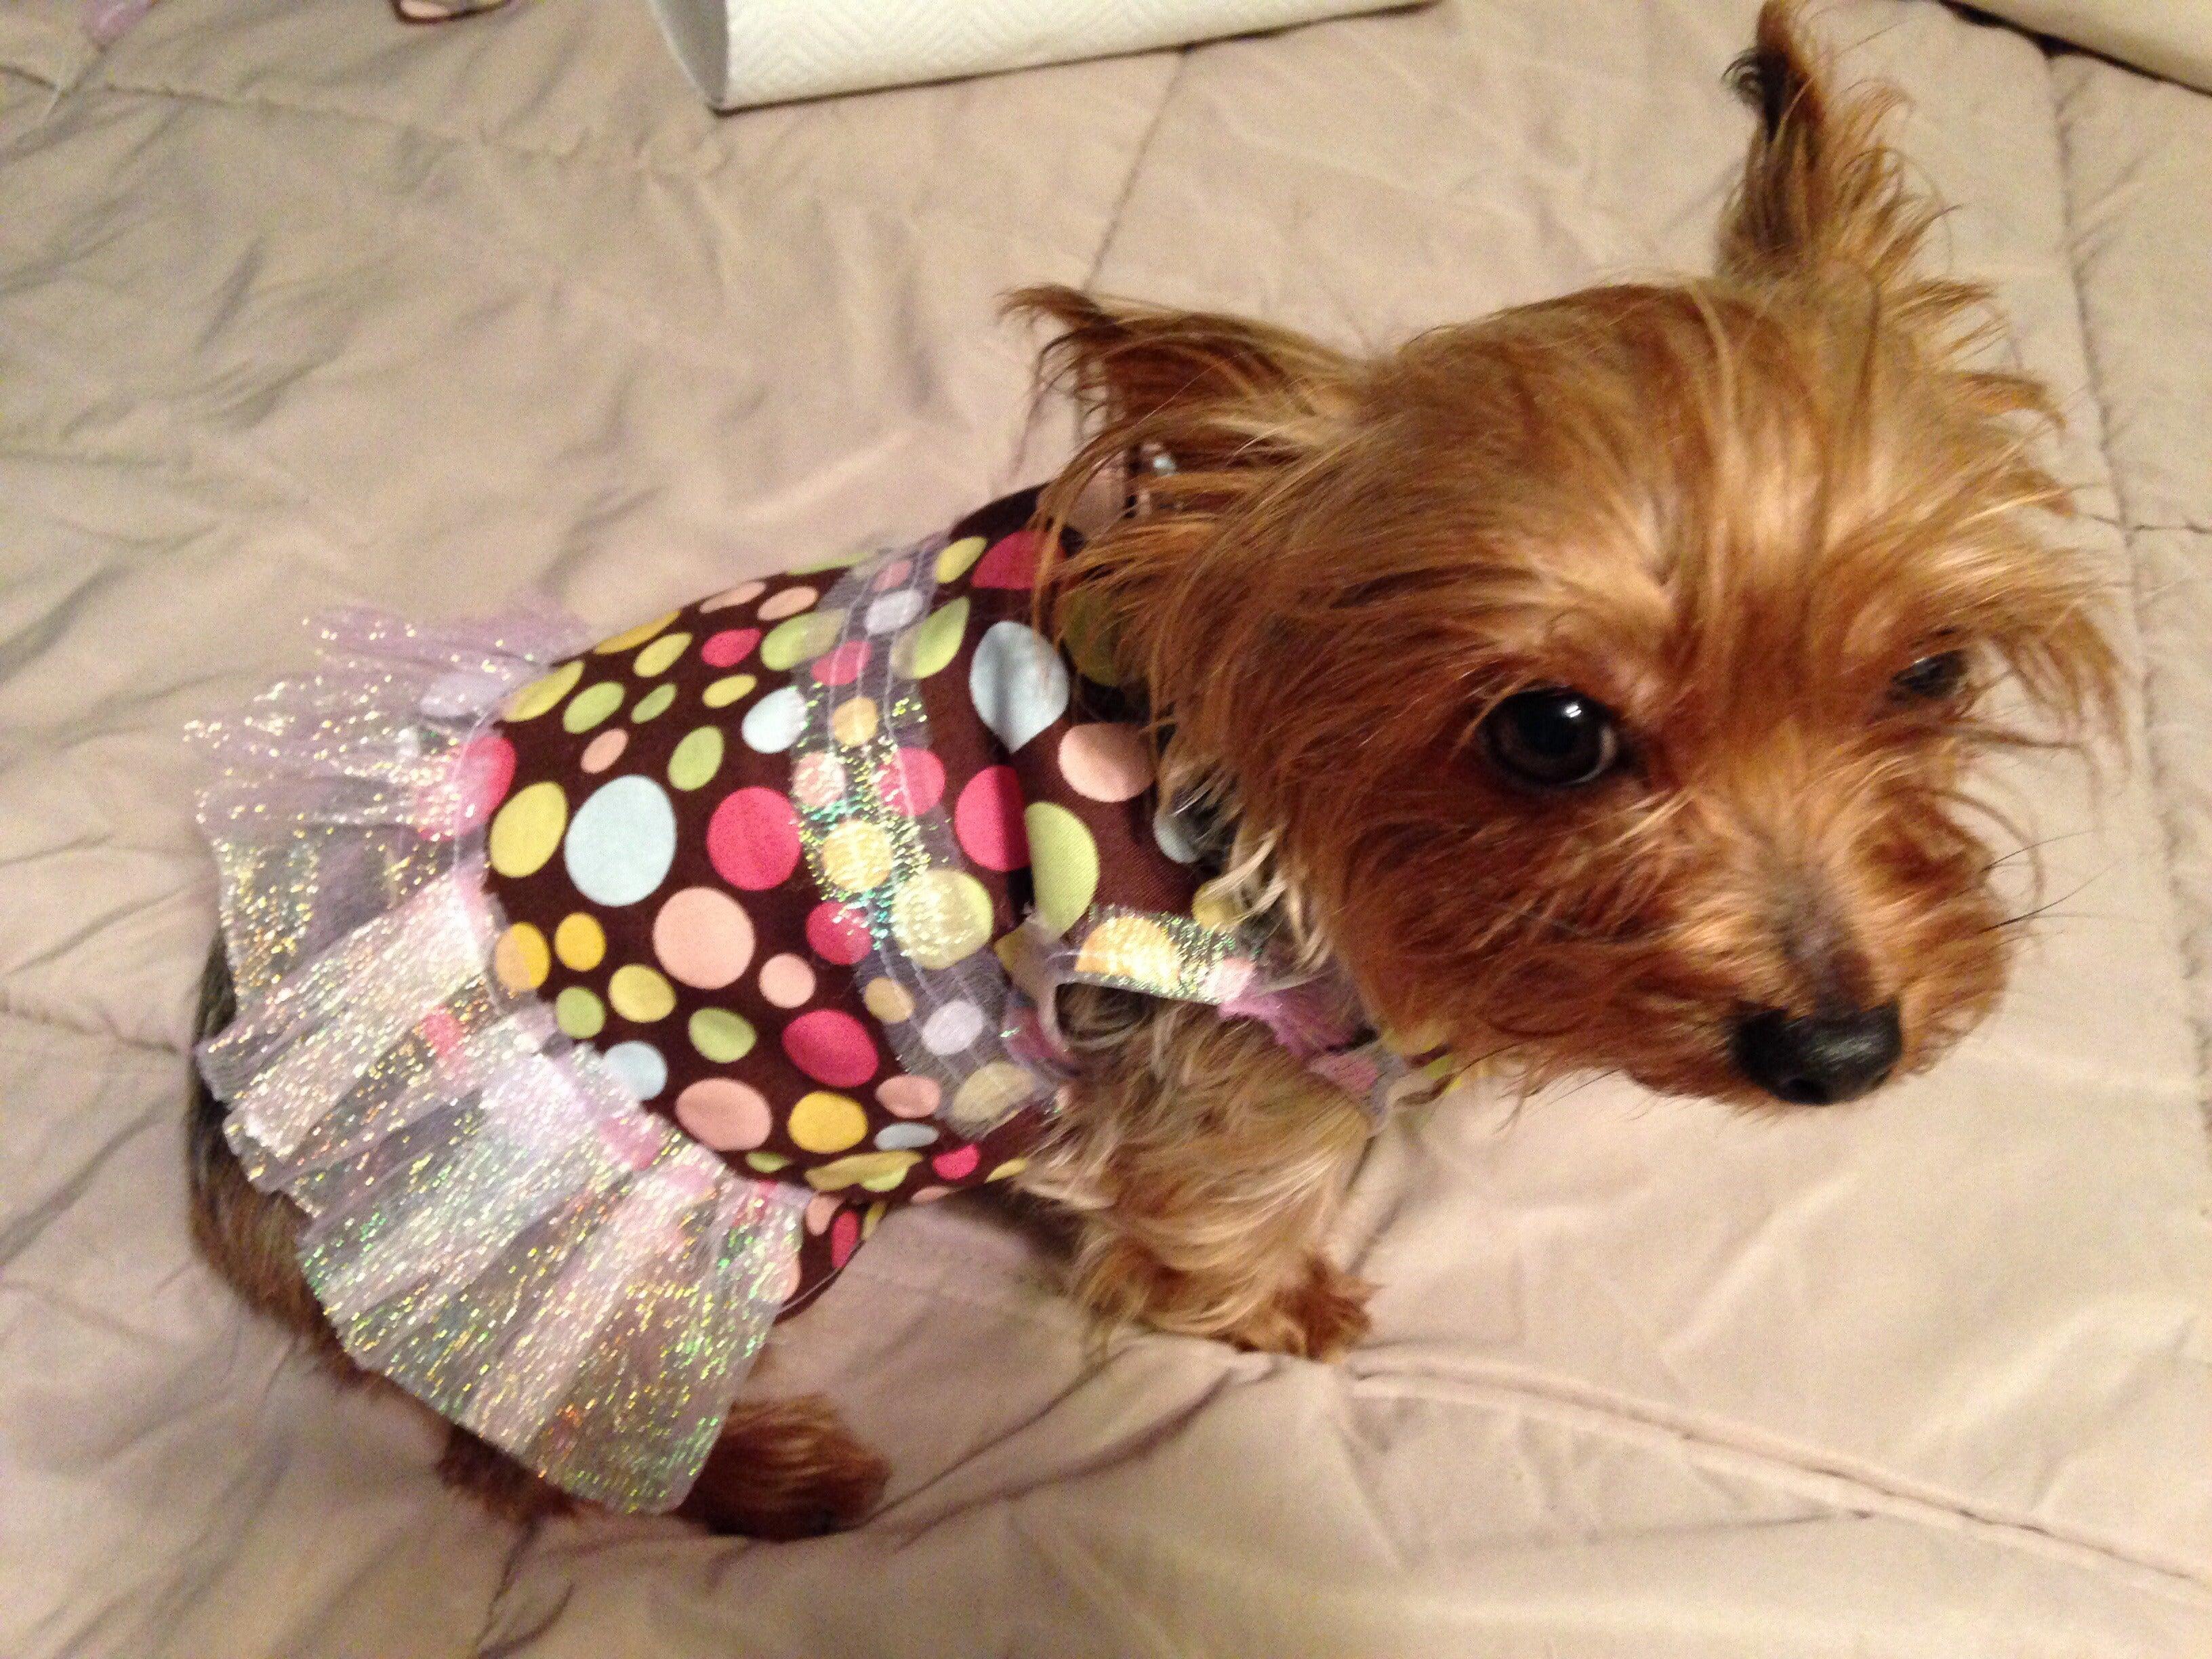 Pet Dress Dress for Pets Dress for Dogs Dog Dress Metallic Dress for Dogs Dog Metallic Dress